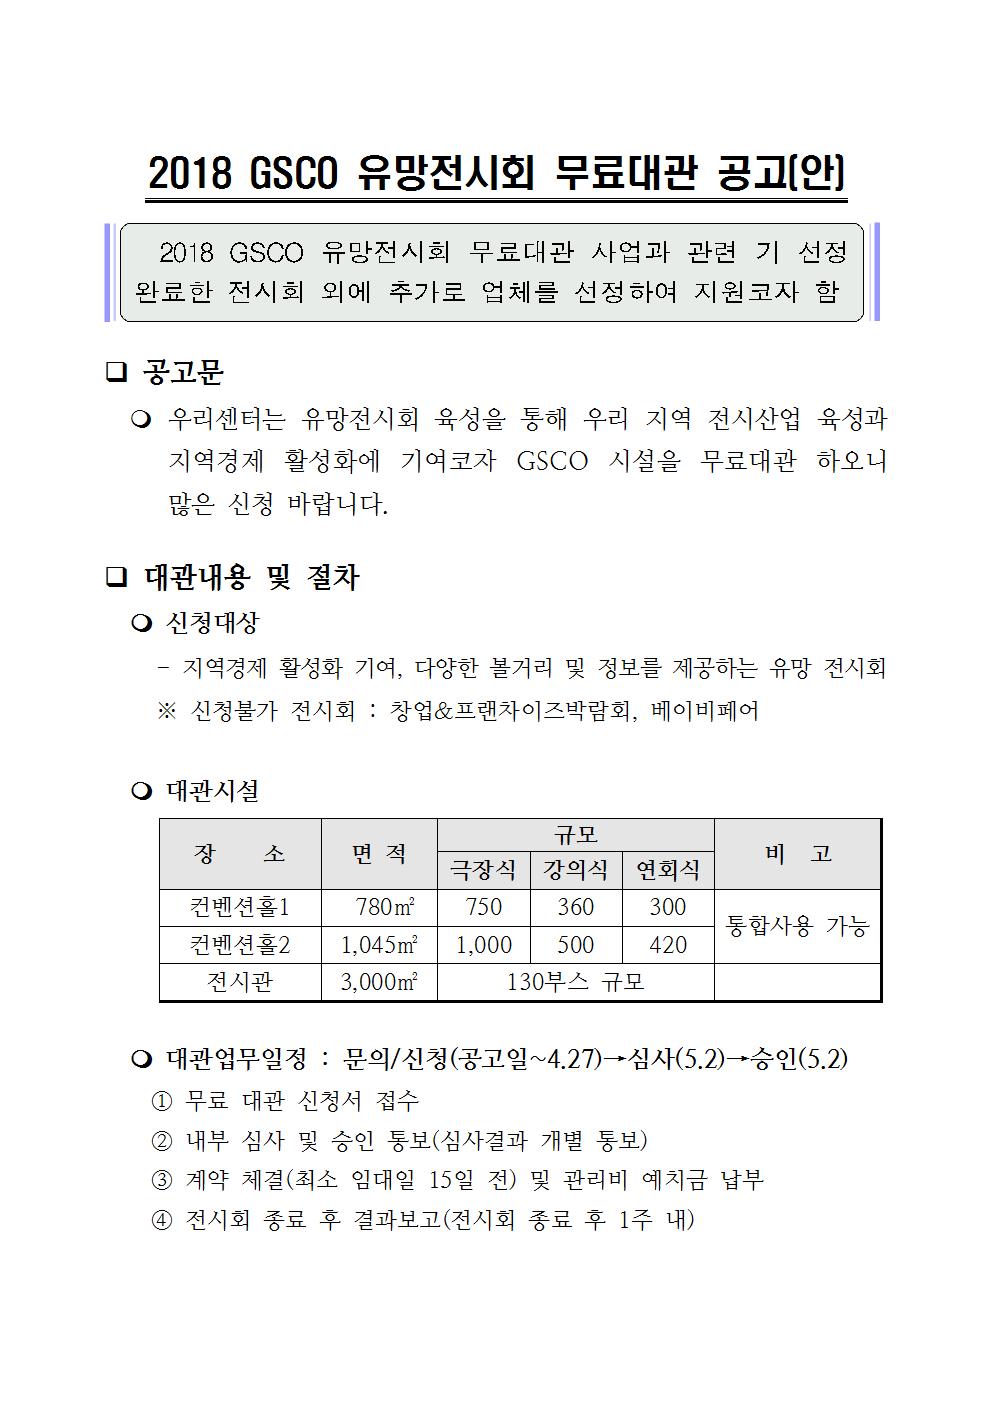 2018 GSCO 유망전시회 추가 모집 공고(안)001